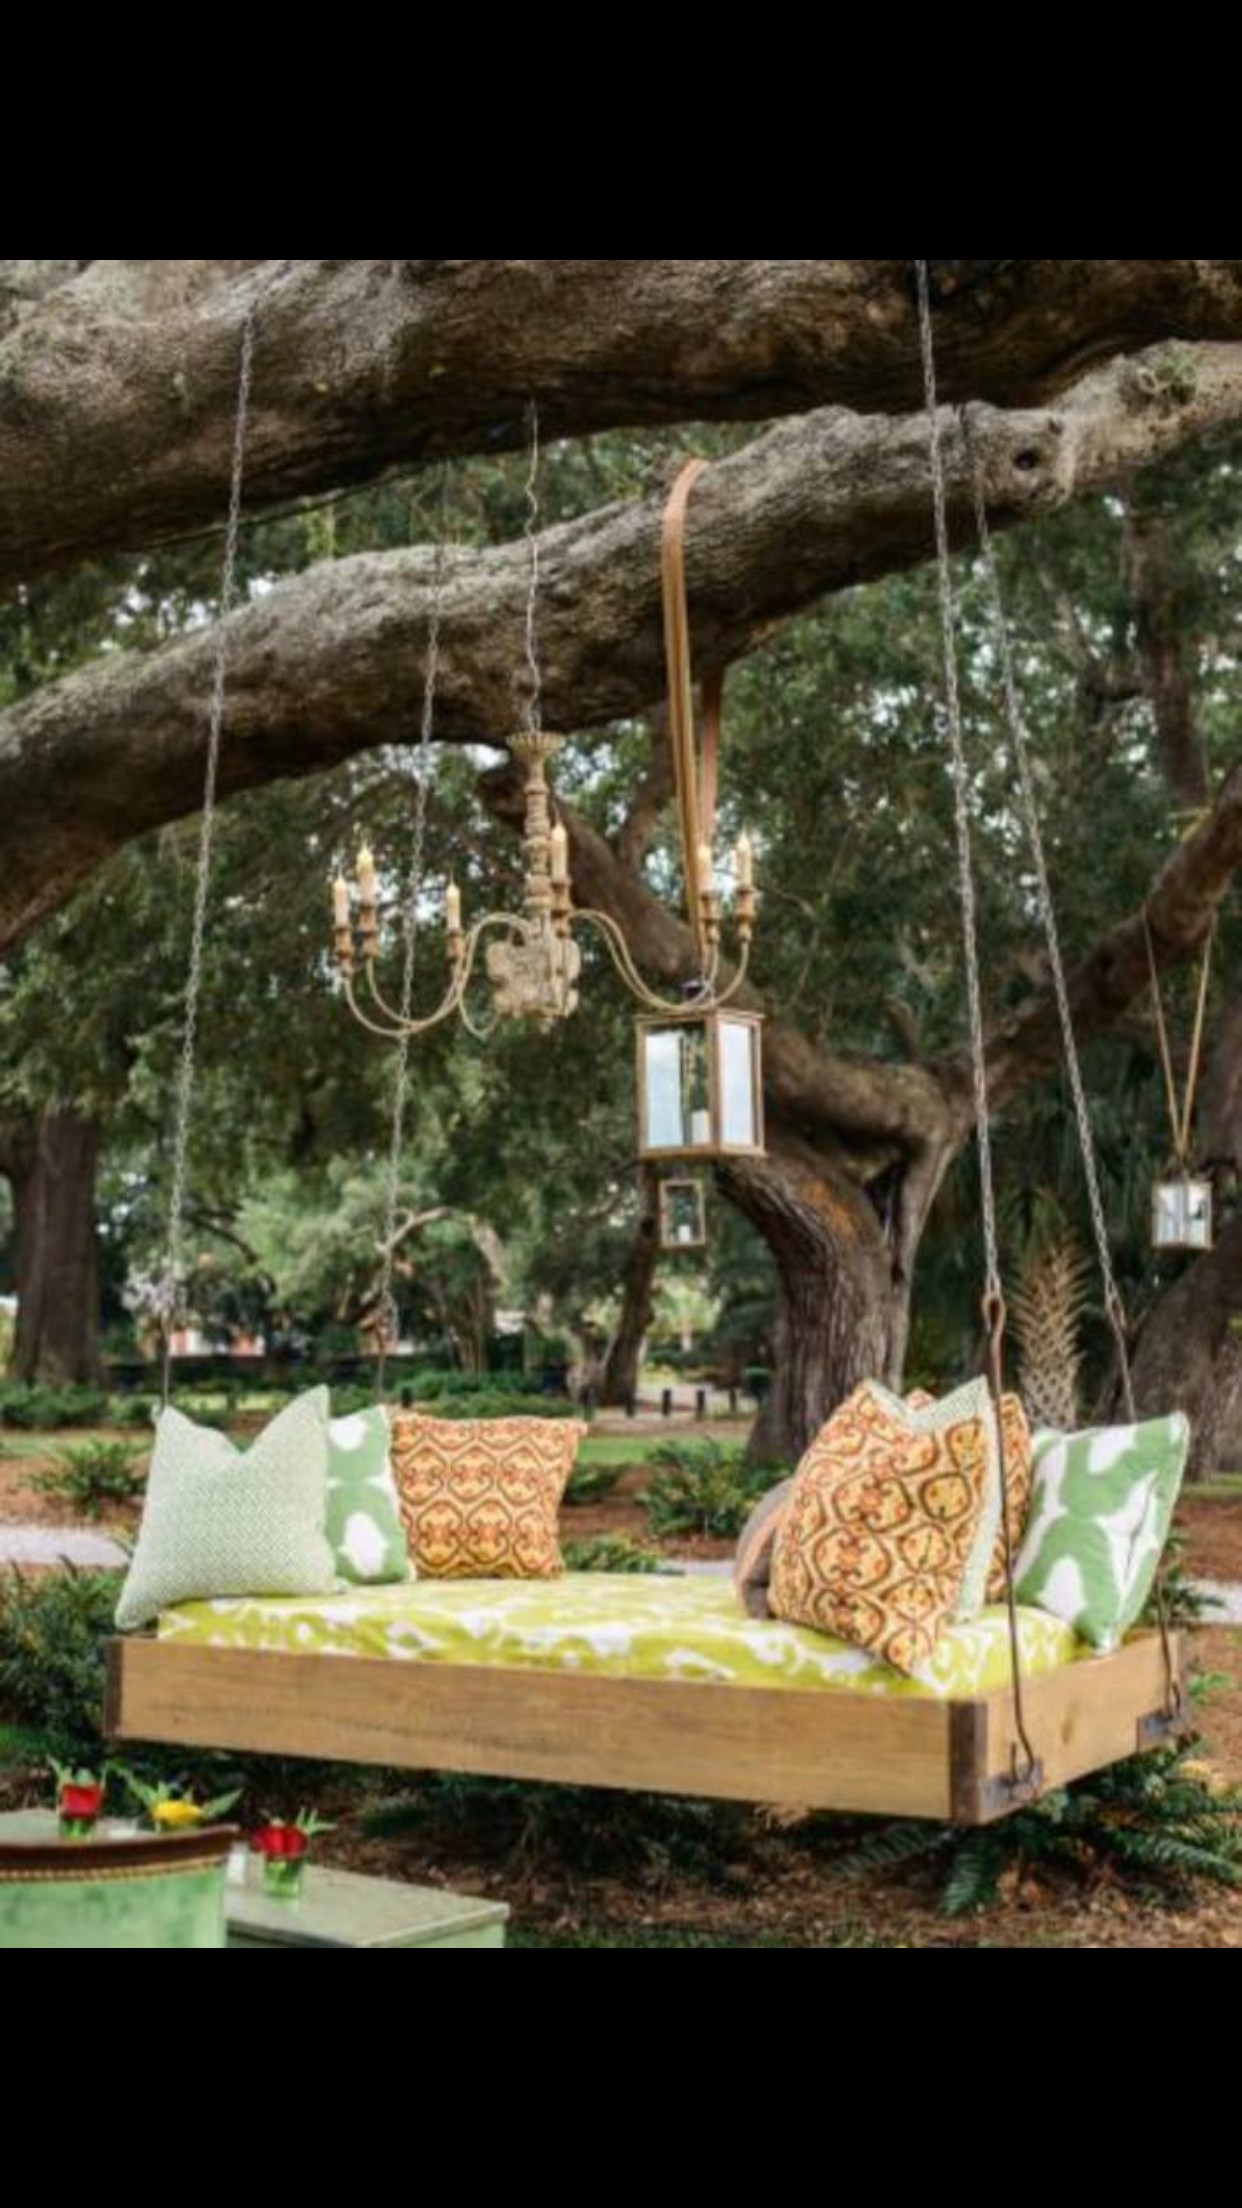 Gorgeous garden swing ♥✿༺ Garden of Eden ༺✿♥